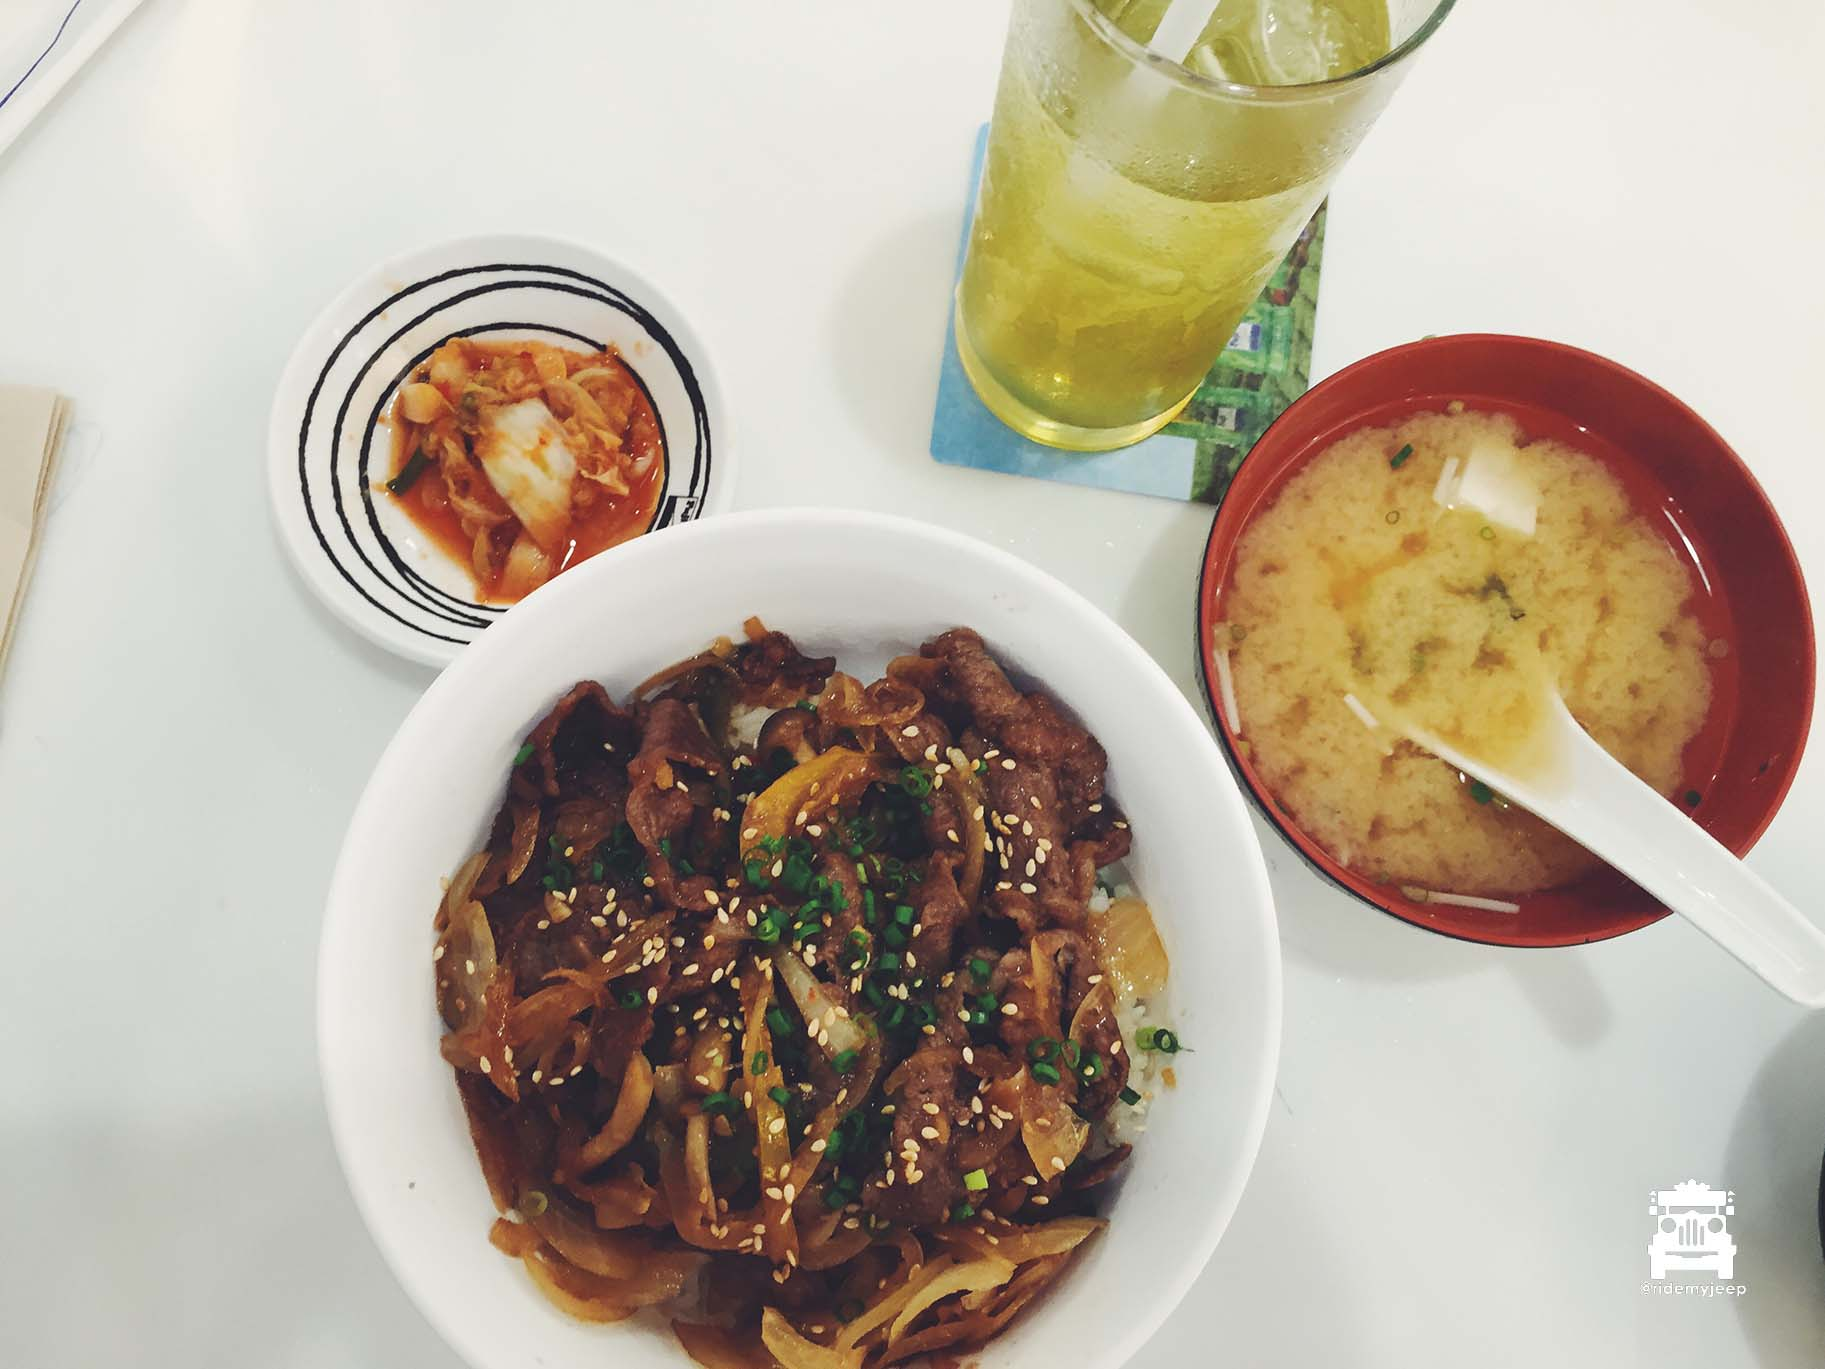 At Fuji Restaurant, gyudon